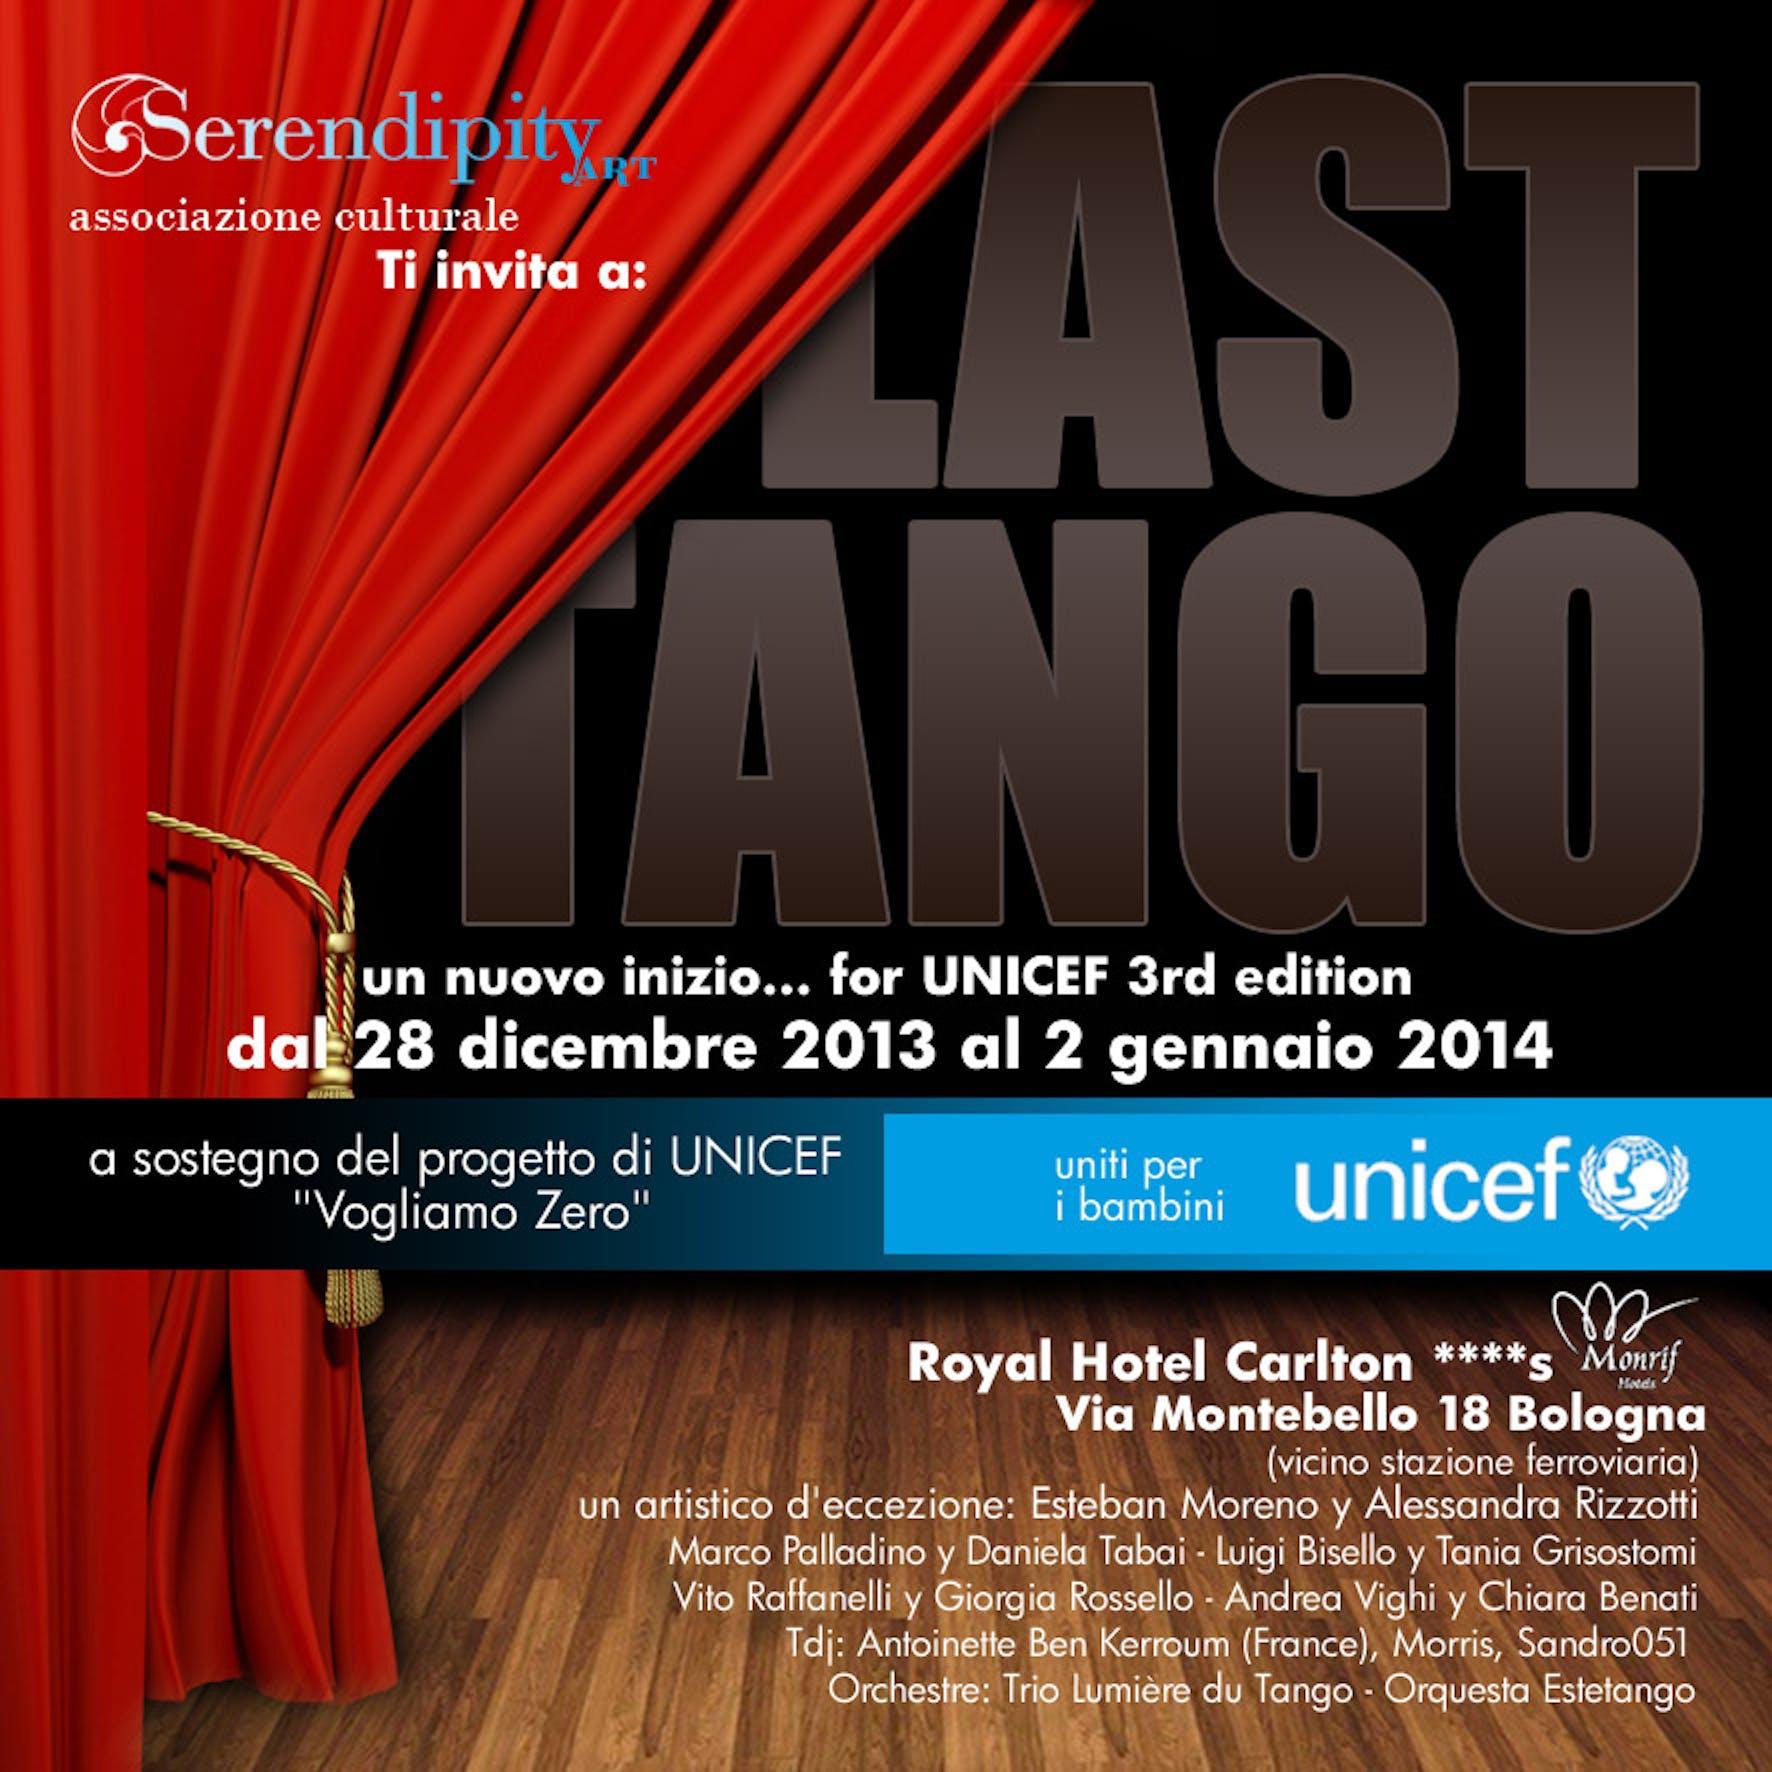 Bologna: al via Last Tango for UNICEF